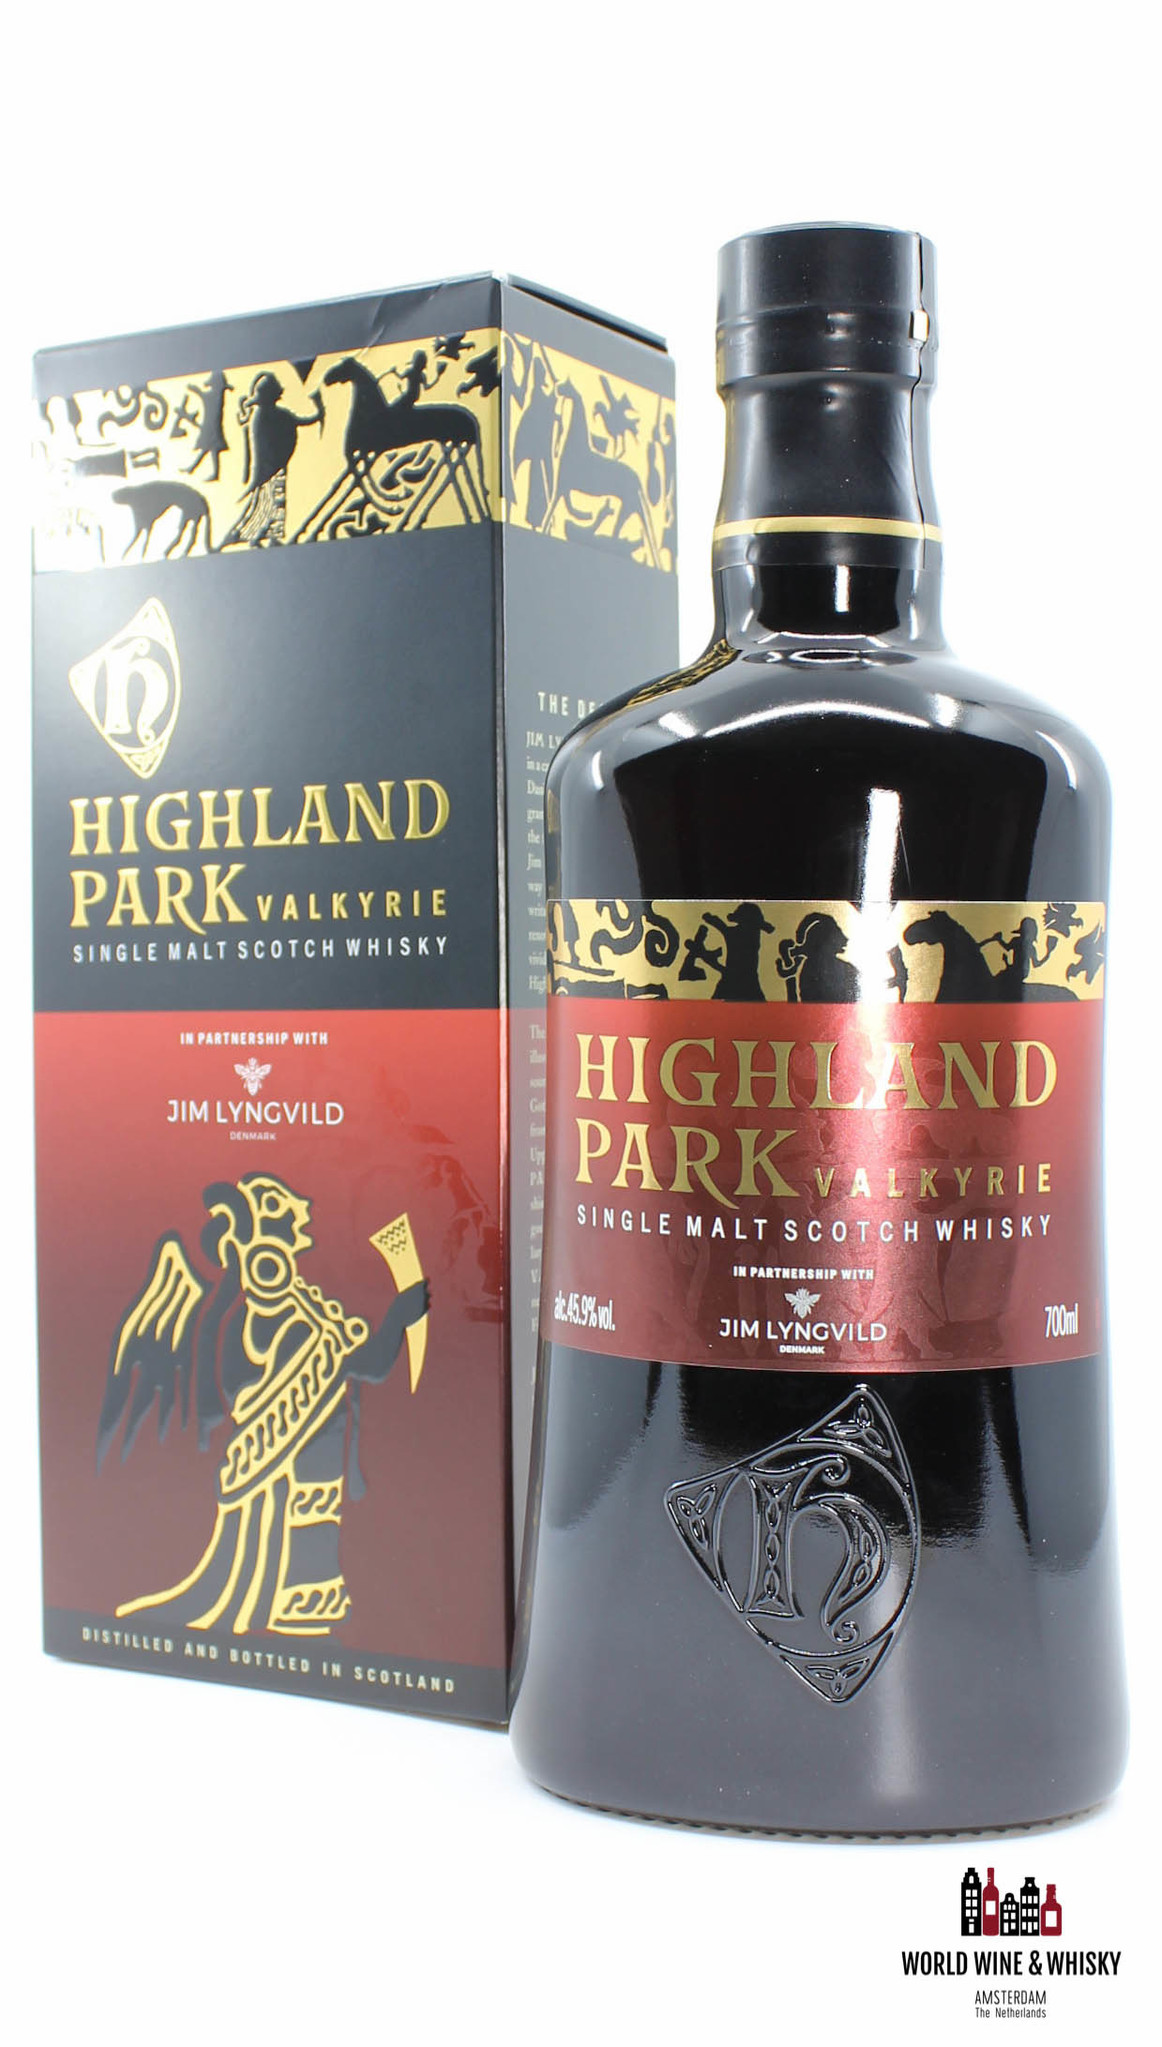 Highland Park  Highland Park Valkyrie 2017 - Viking Legend - Jim Lyngvild Denmark 45.9%